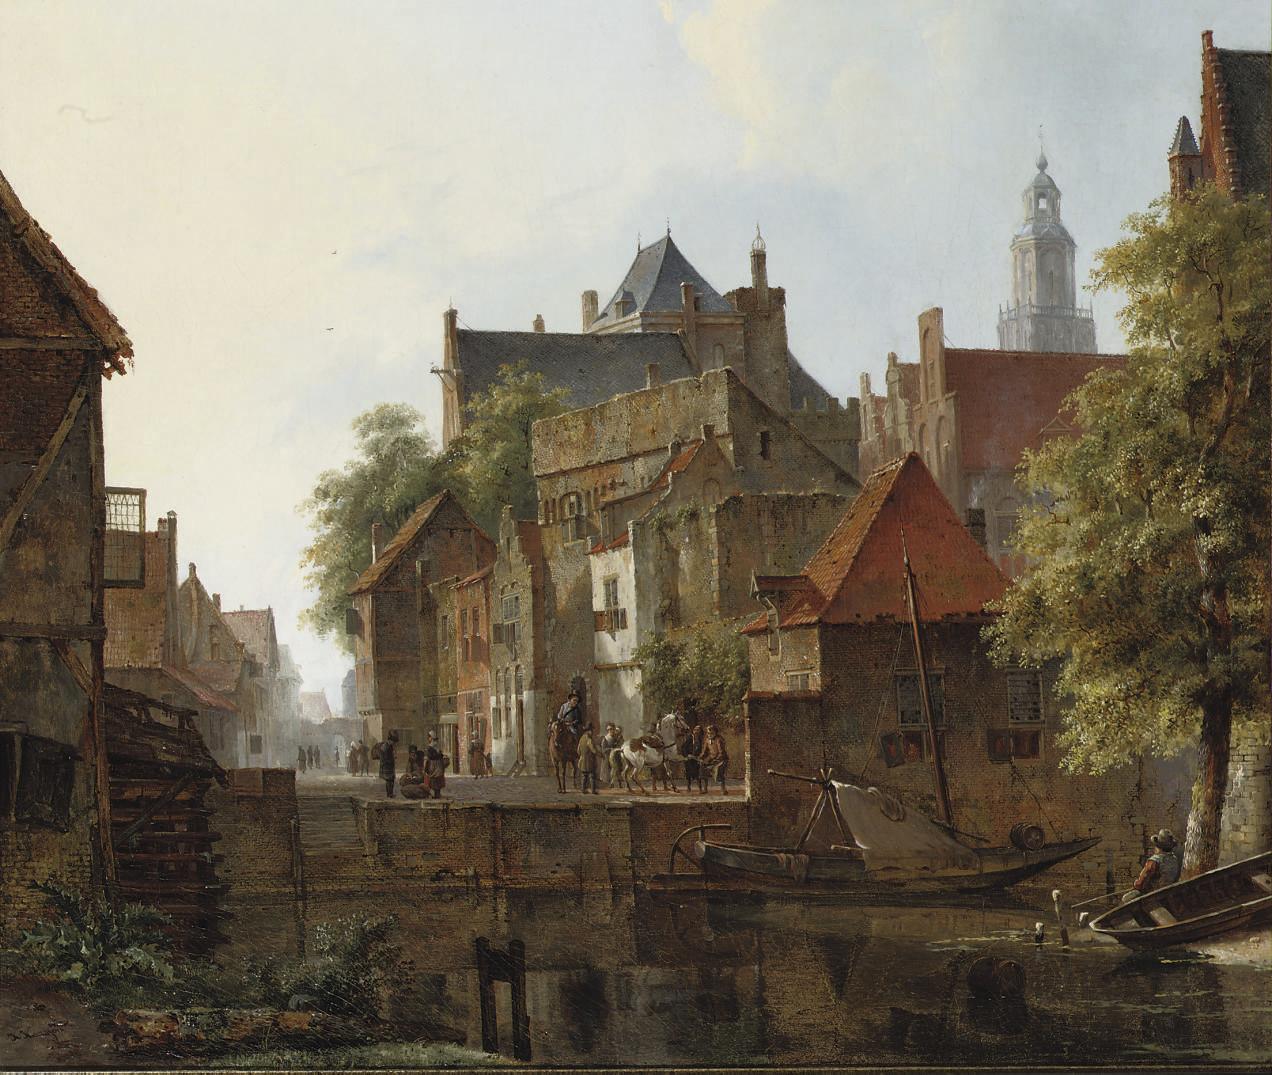 Horsemen on a quay in a Dutch town in summer